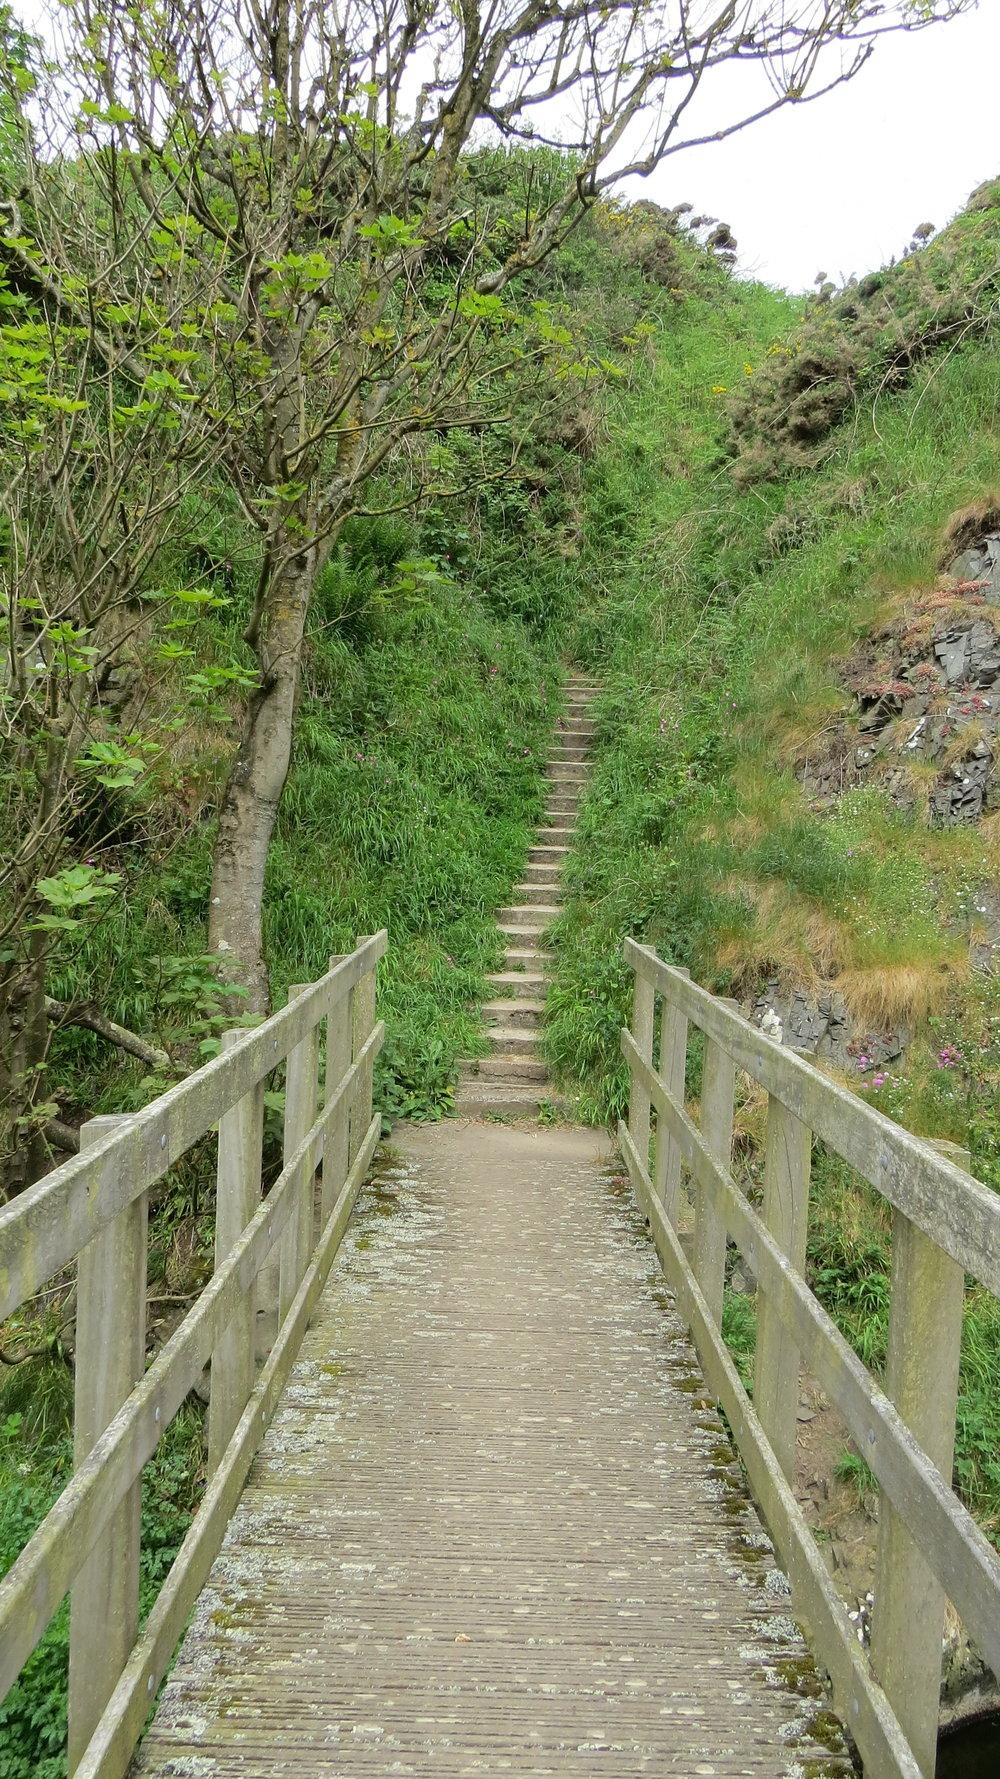 Bridge to Steep Stairs